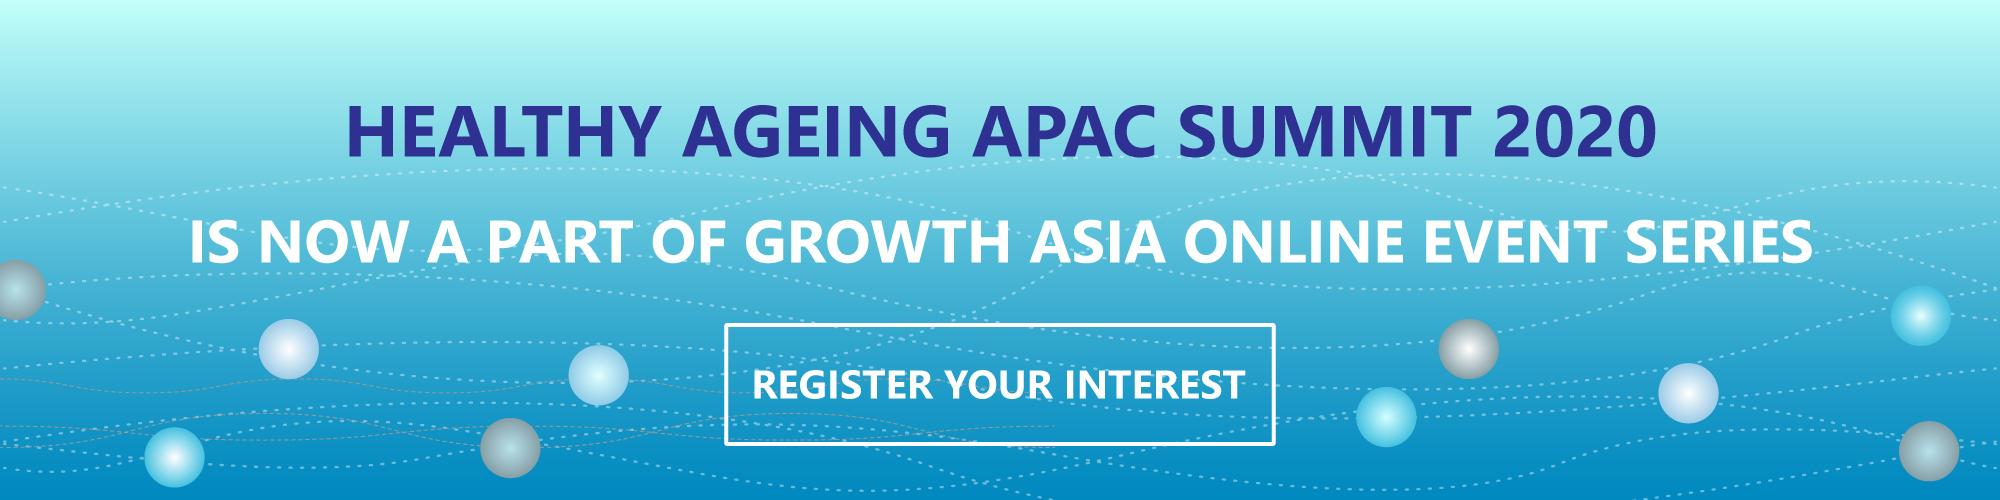 Healthy Aging APAC 2020